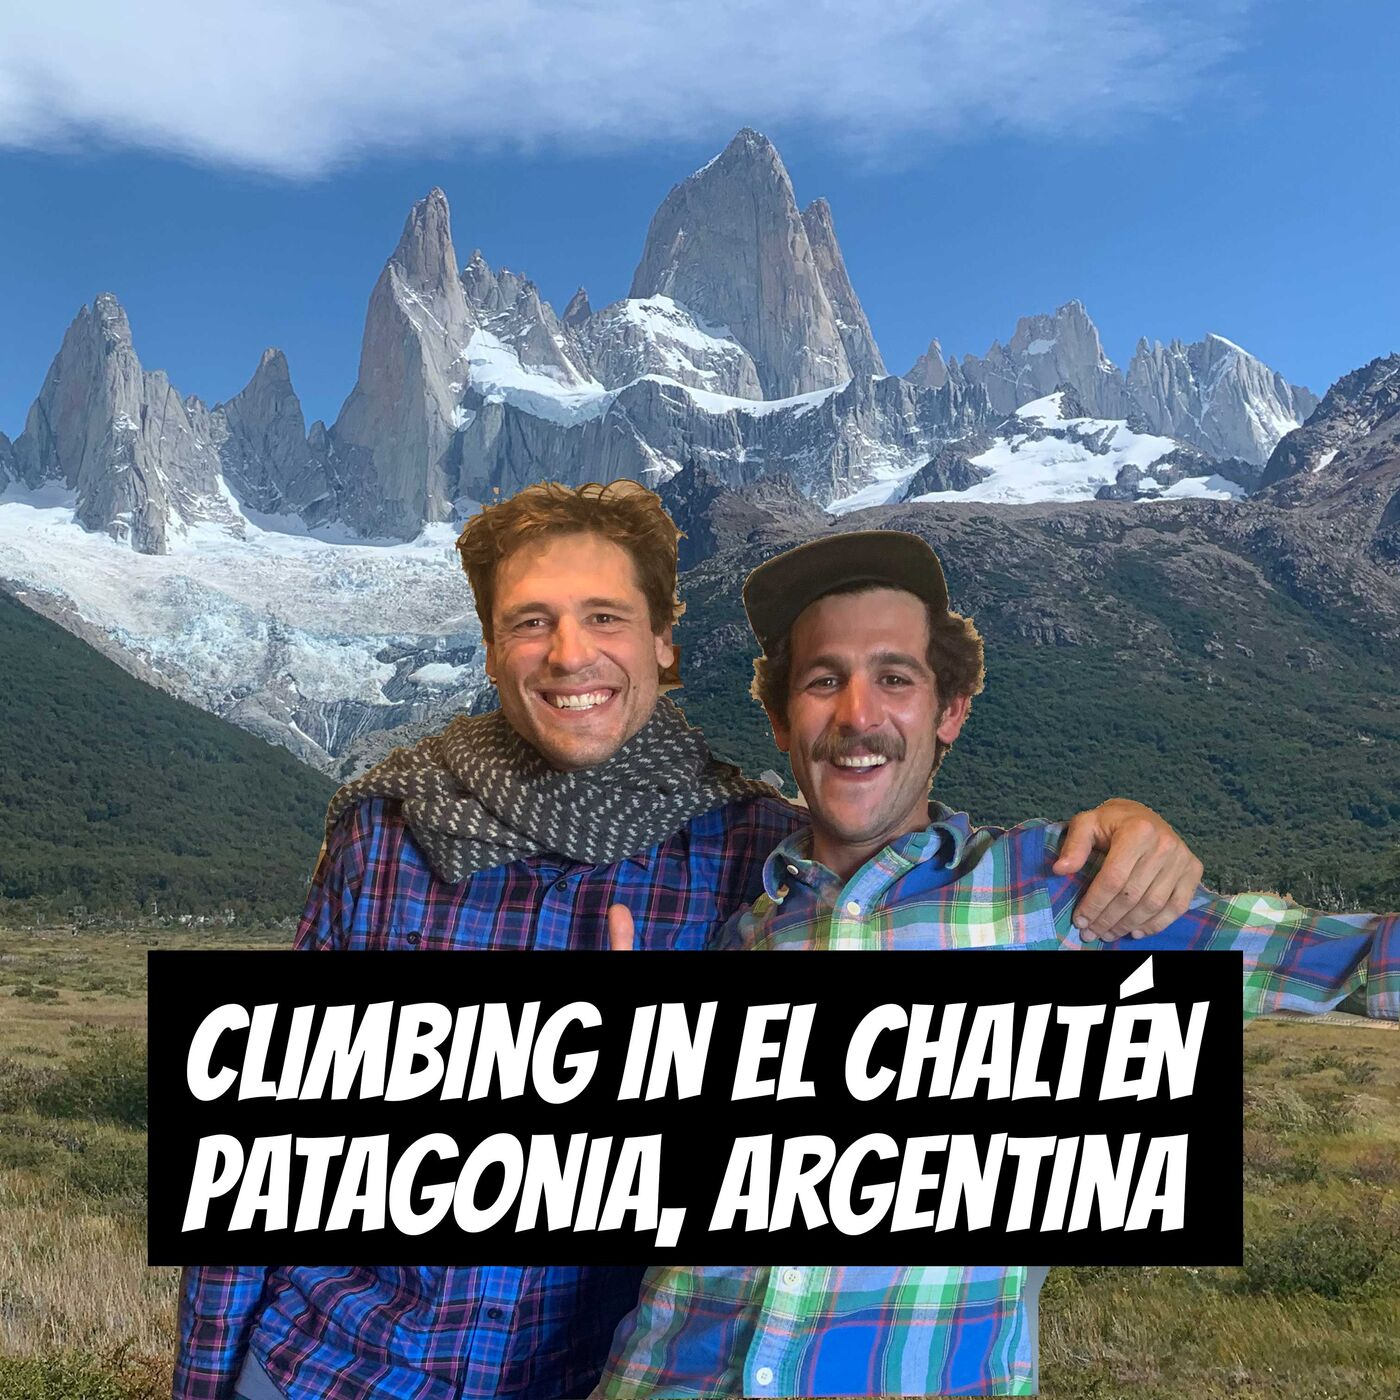 #89 - Climbing in El Chaltén, Patagonia, Argentina | Tad McRae & Agustin Burgas [ENGLISH]